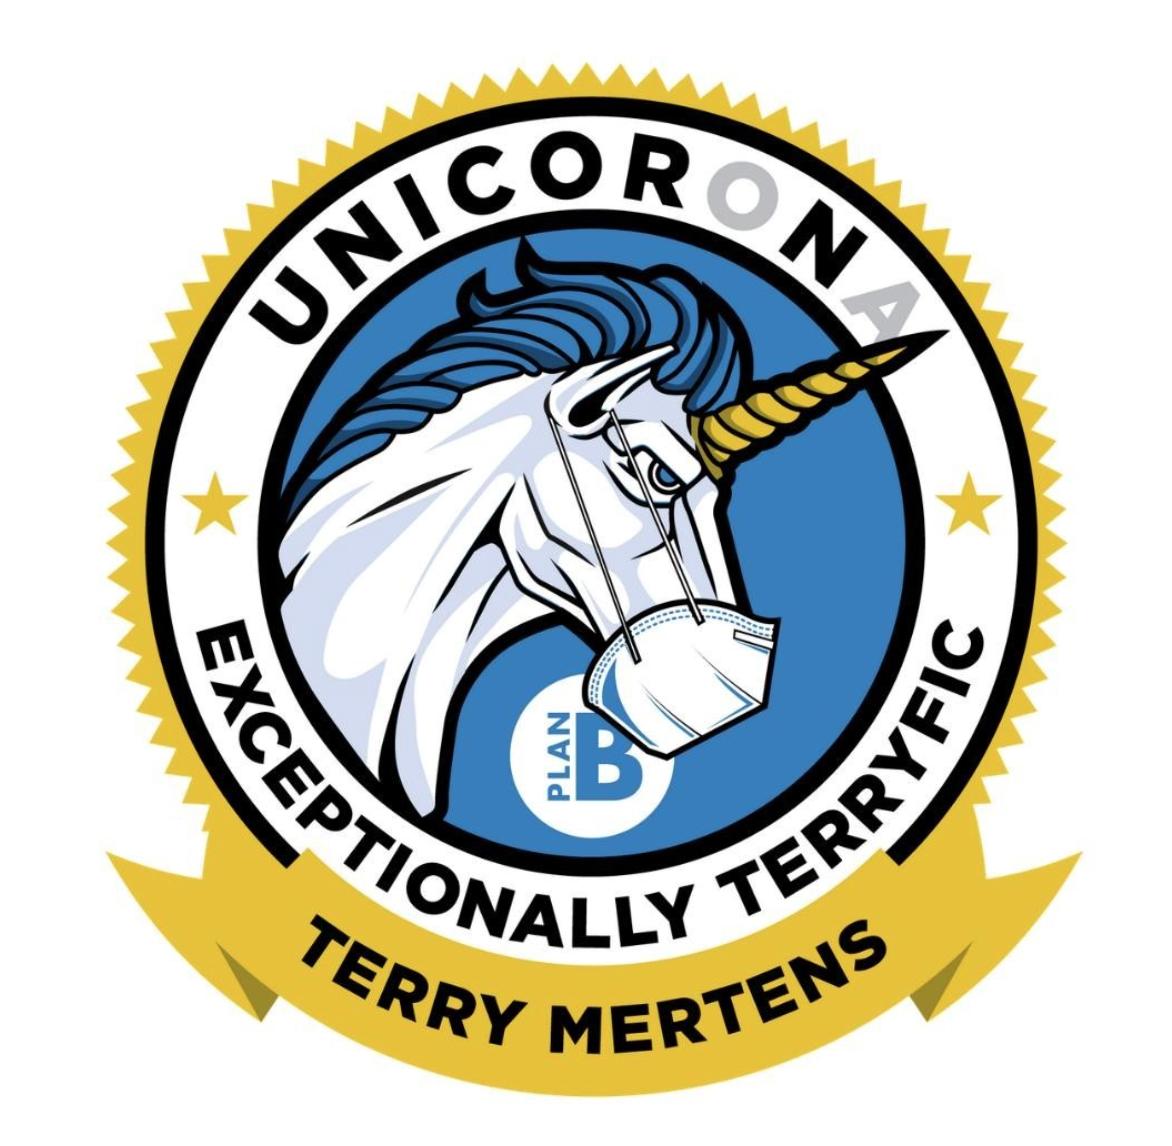 Terry Mertens Unicorn